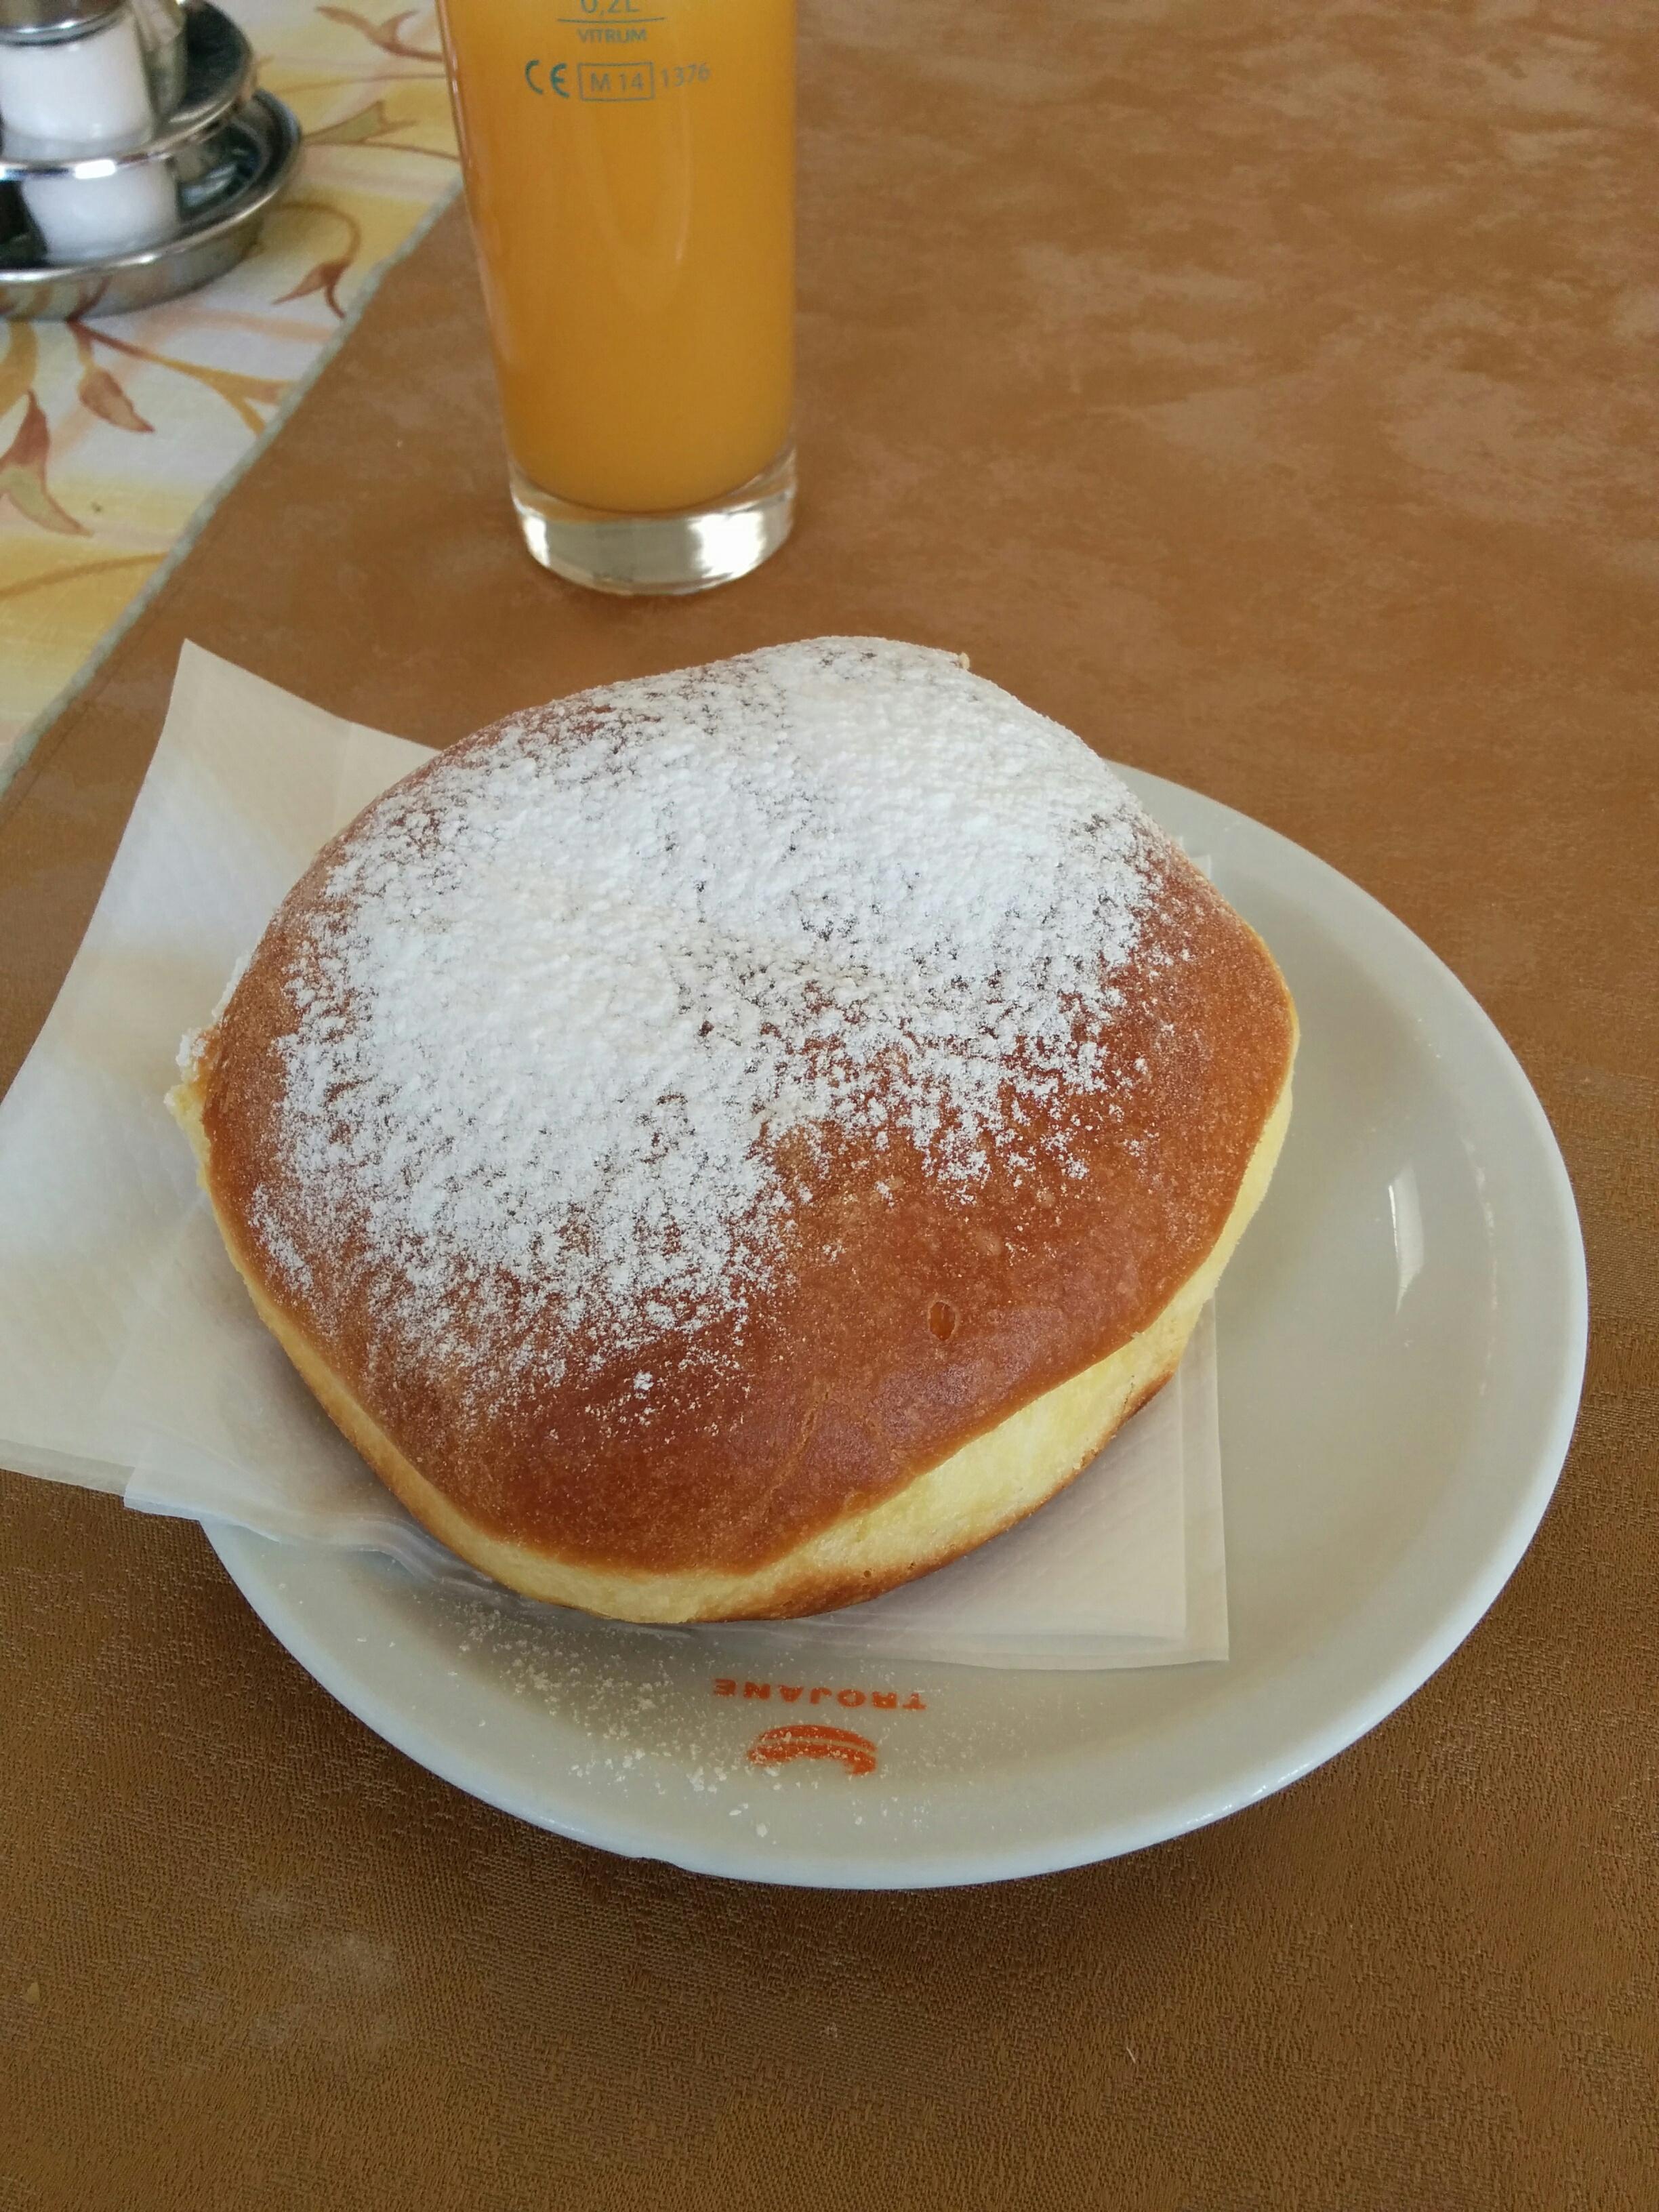 Trojane donut